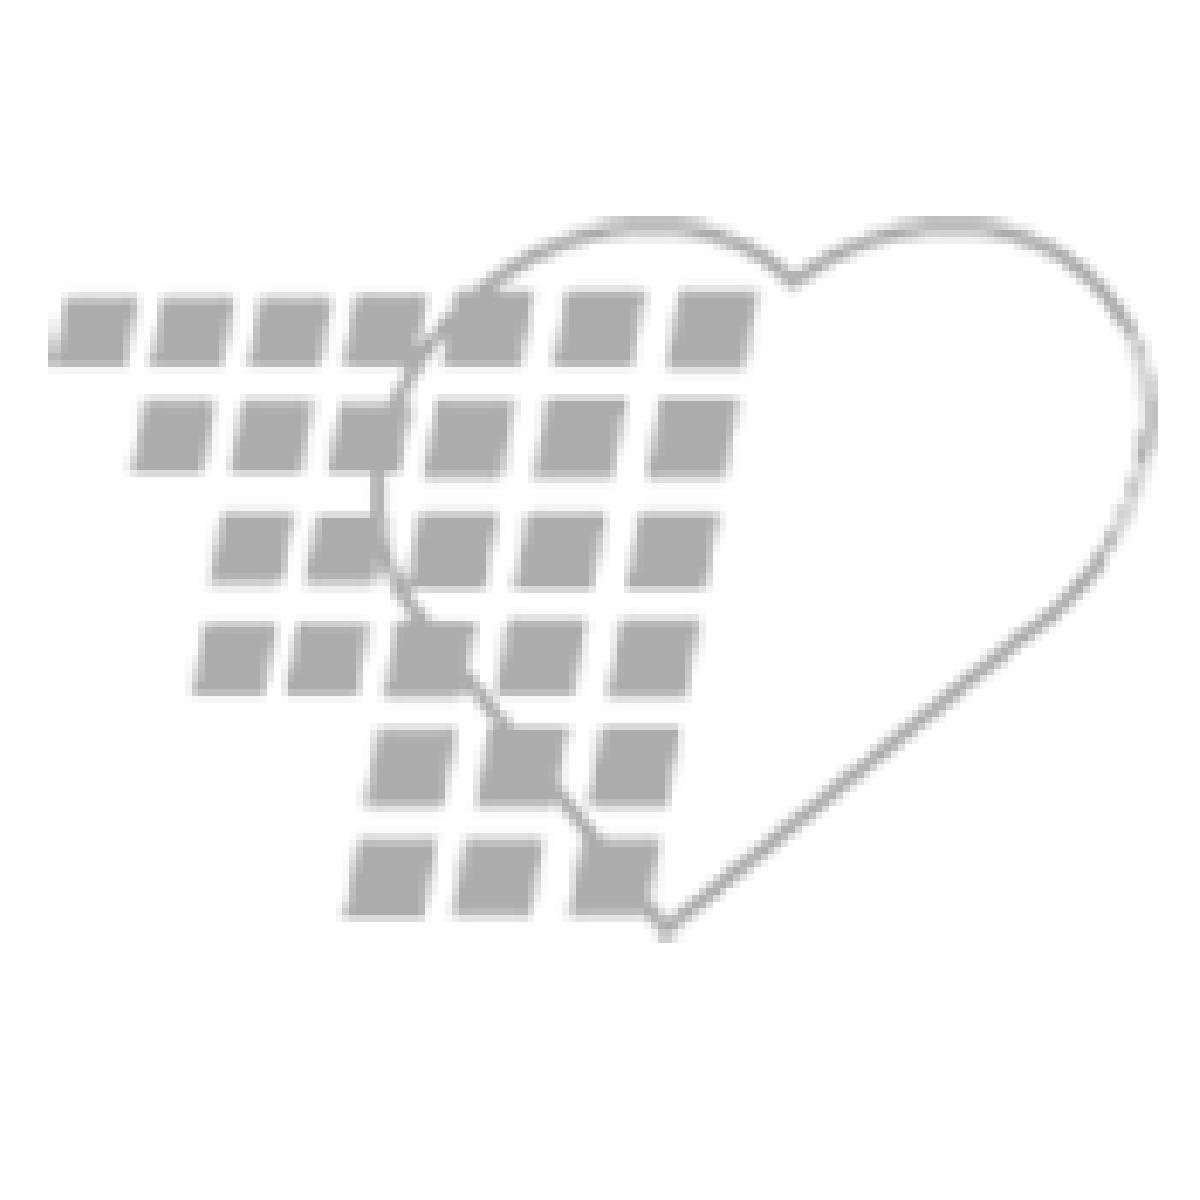 06-93-0062 - Demo Dose® LORazepm (Ativn) 2mg tablet UD - 100 Pills/Box